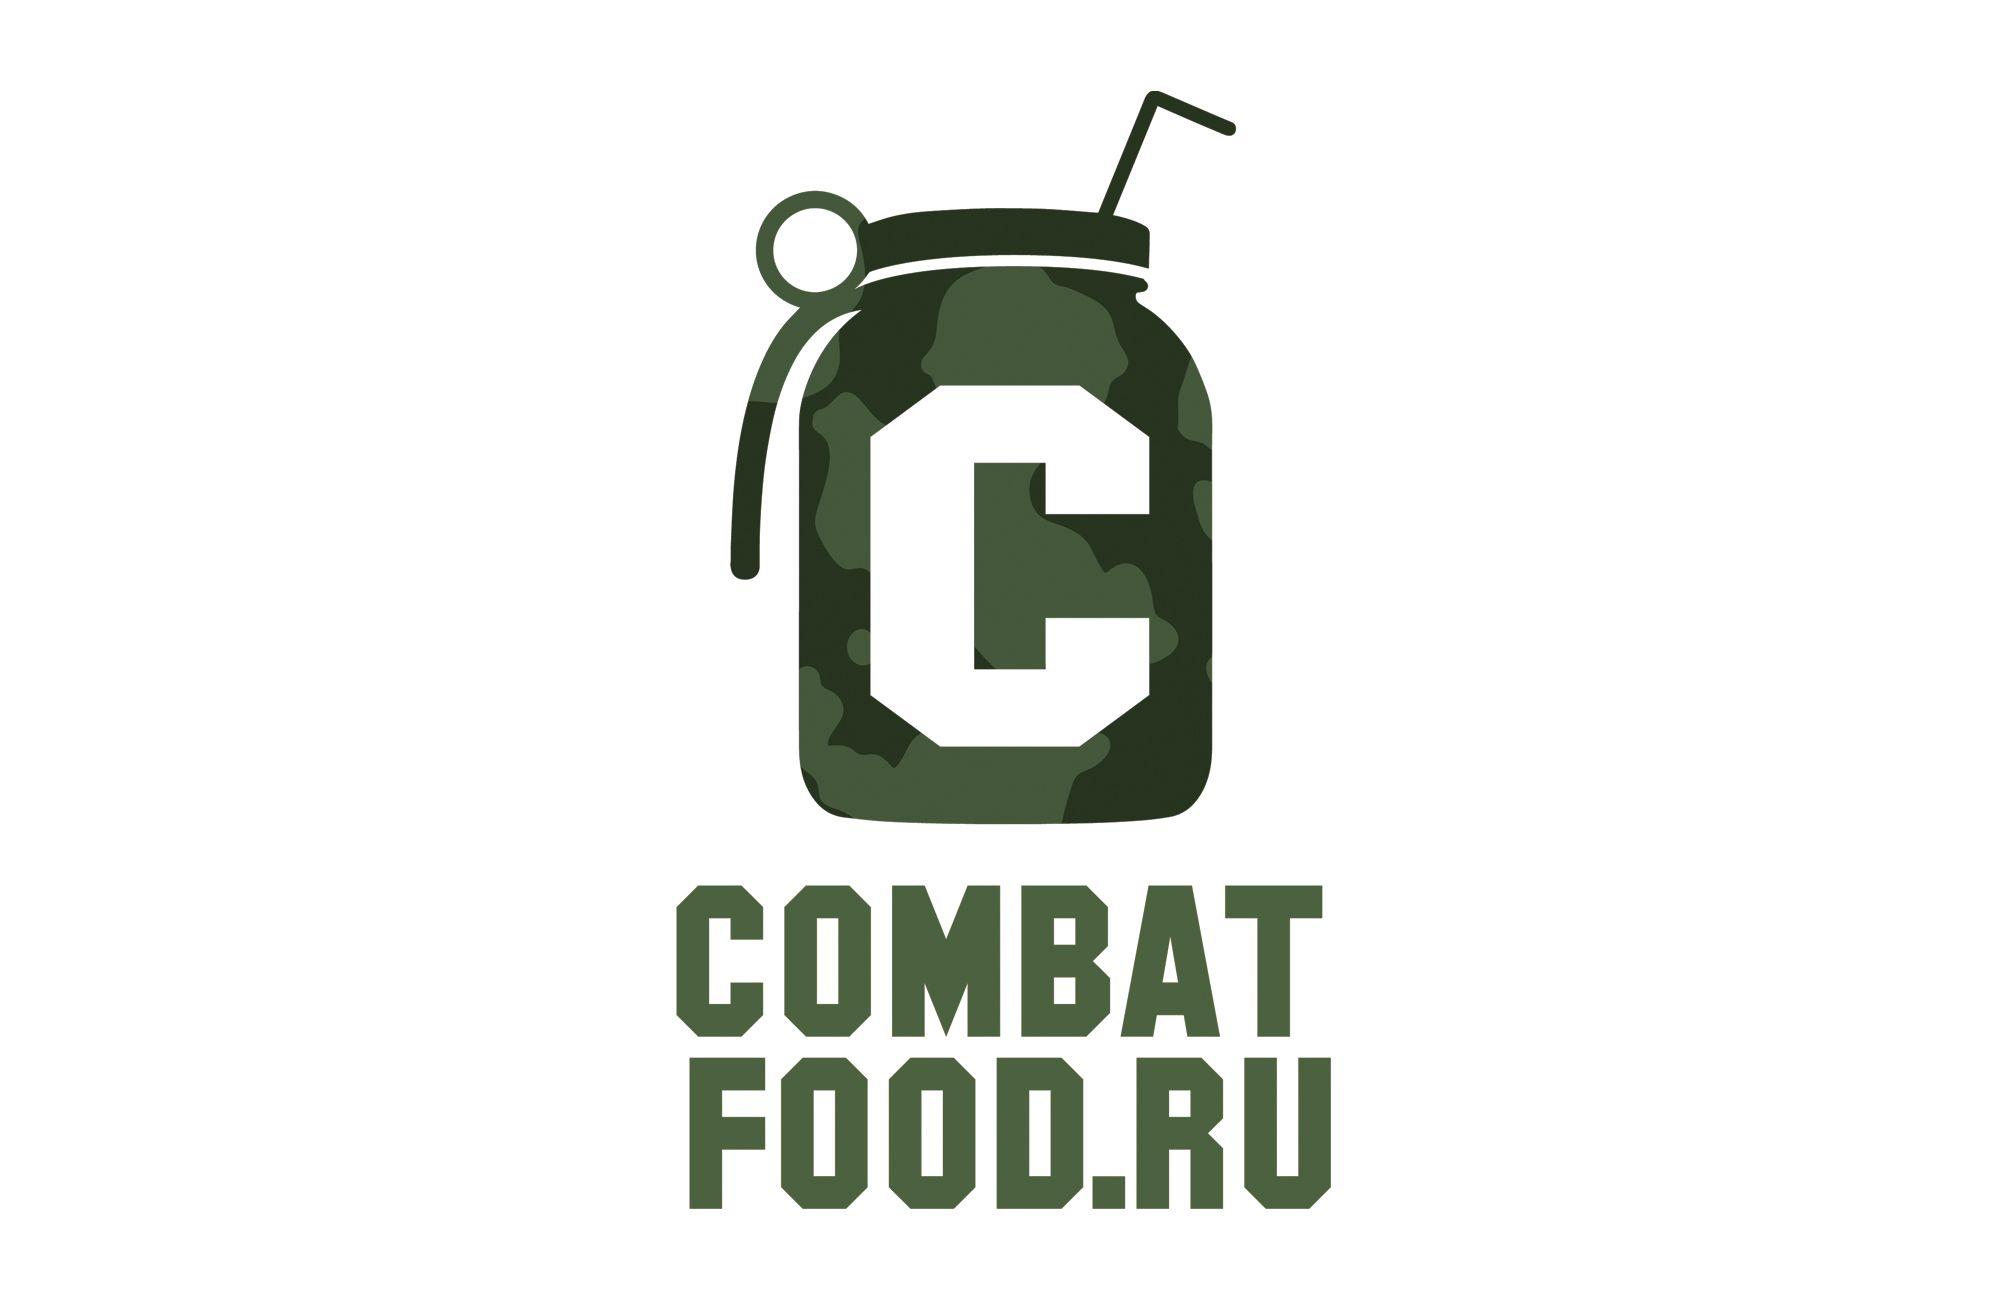 Логотип для интернет-магазина спортивного питания - дизайнер xxxdrugfree